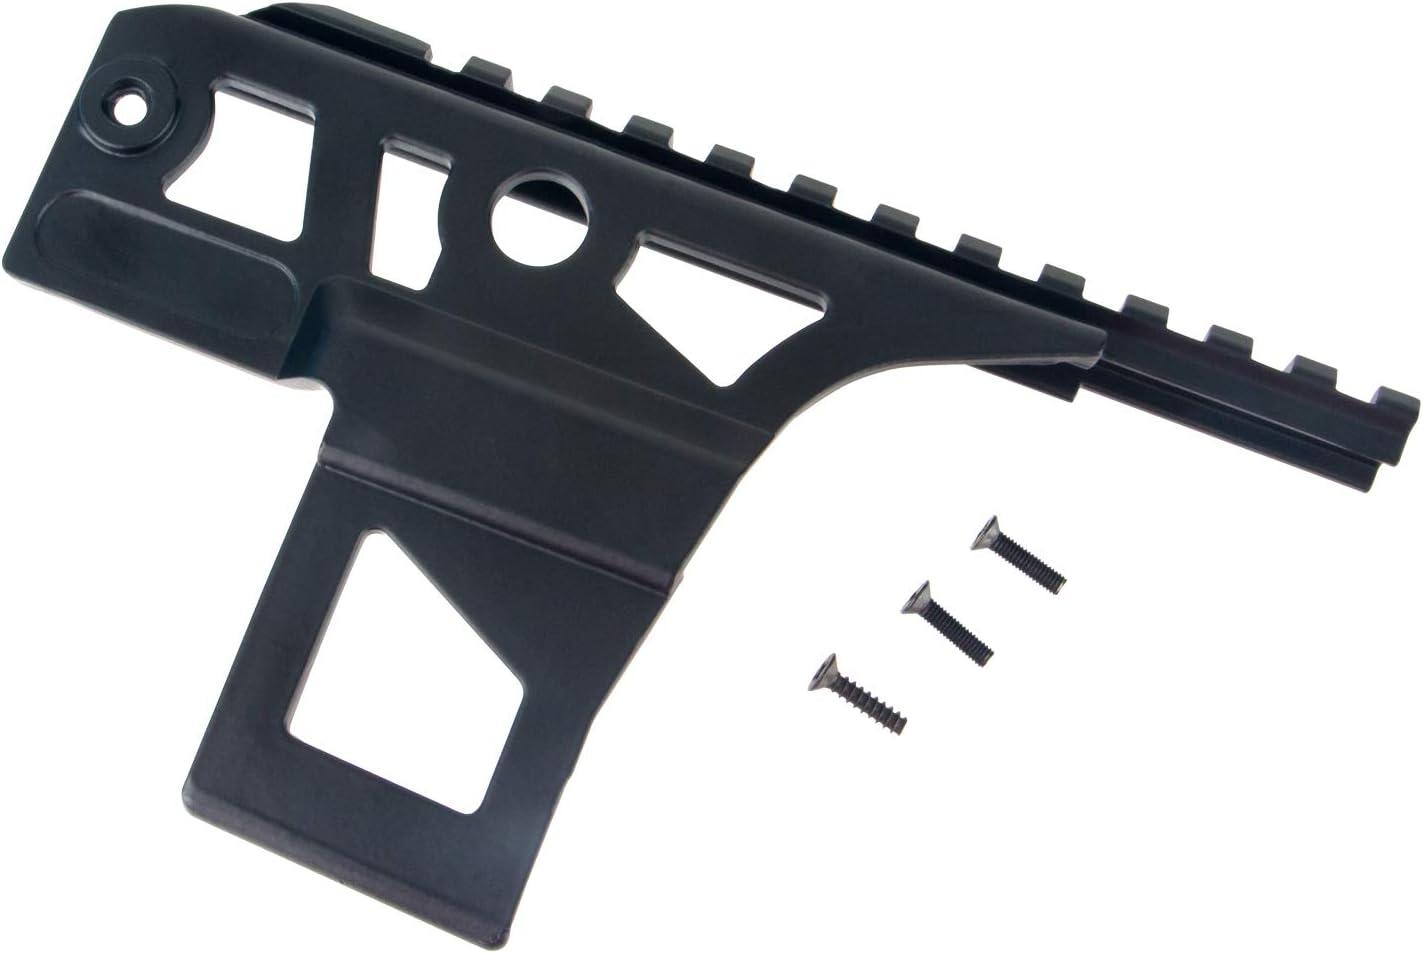 FOCUHUNTER Placa de riel de Cola de Milano de Montaje Lateral táctico AK47 Ligero Metal Picatinny Weaver Soporte de riel Compatible Accesorios de Caza Full Metal Black para Caza Exterior